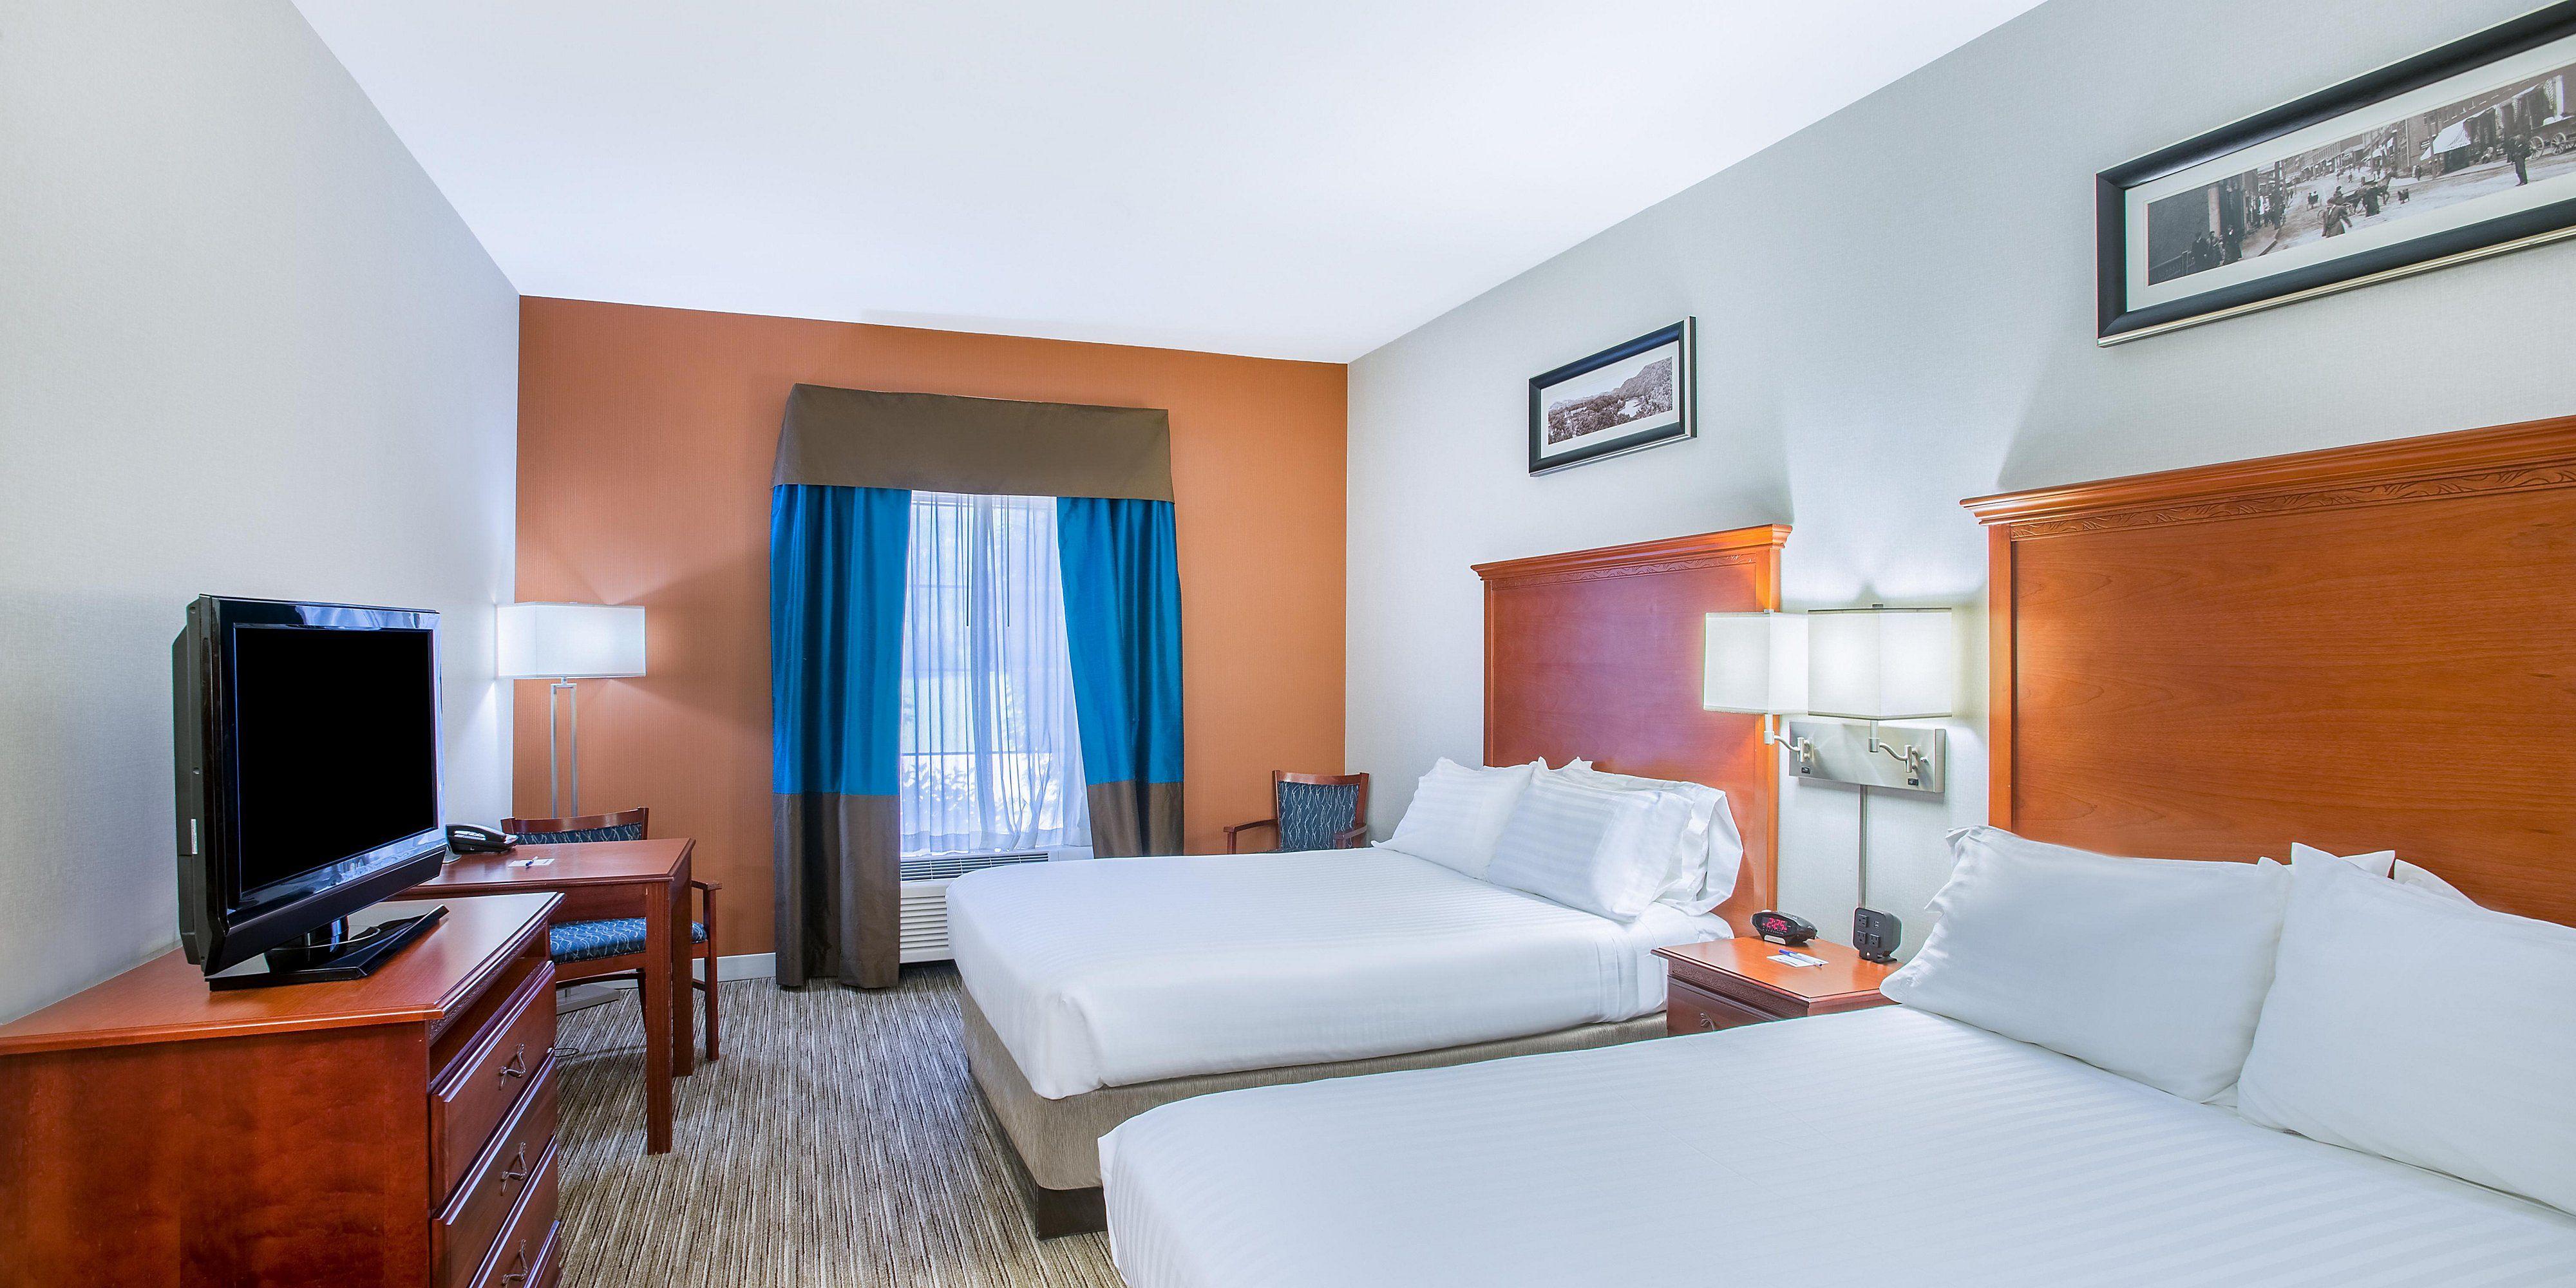 Hotel In Brattleboro Vt Holiday Inn Express Brattleboro Ihg With Images Holiday Inn Madrid Restaurants Hotel Suites